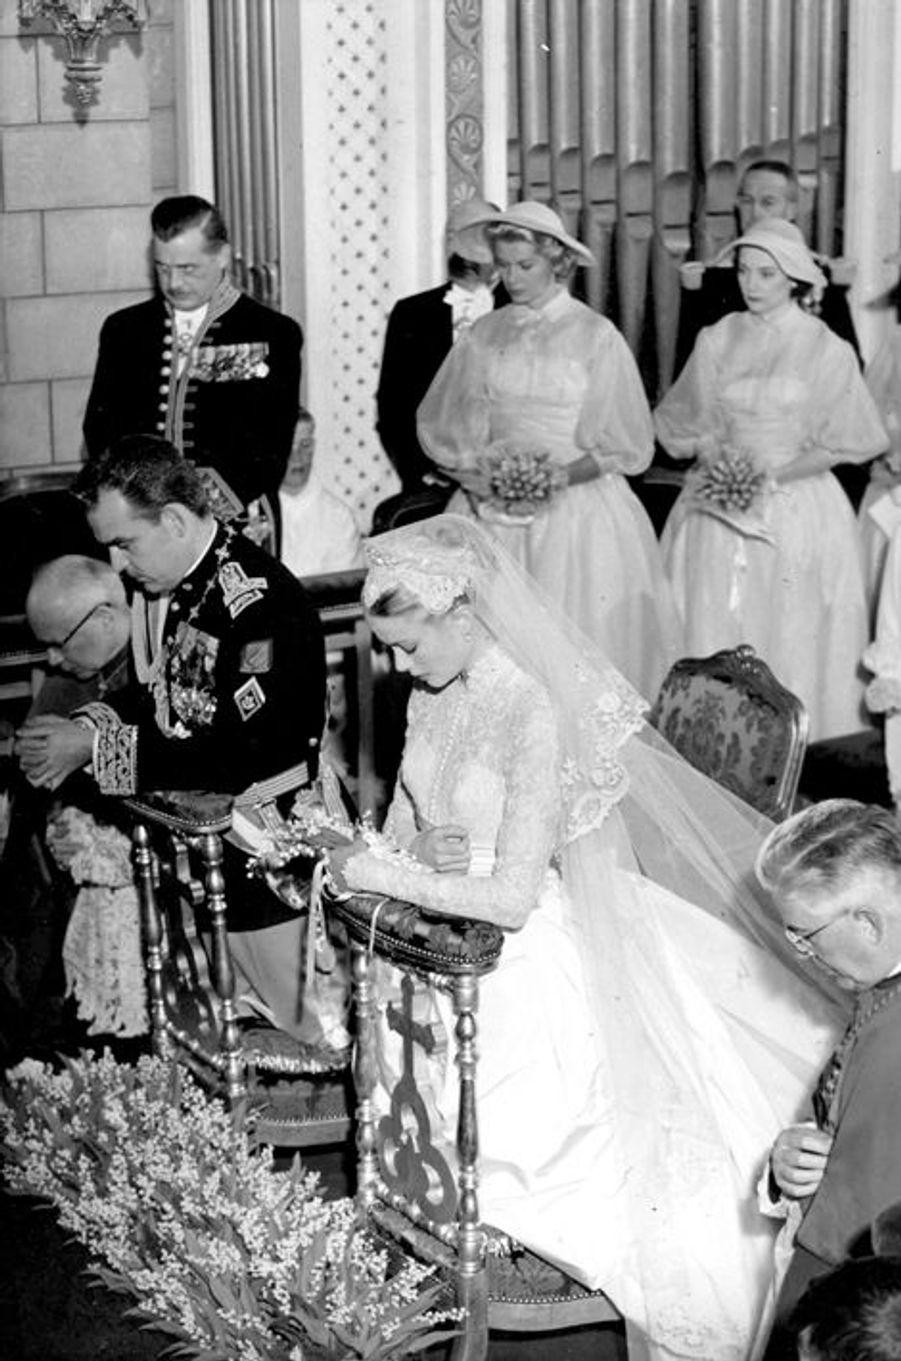 Mariage du prince Rainier III de Monaco avec Grace Kelly, le 14 avril 1956